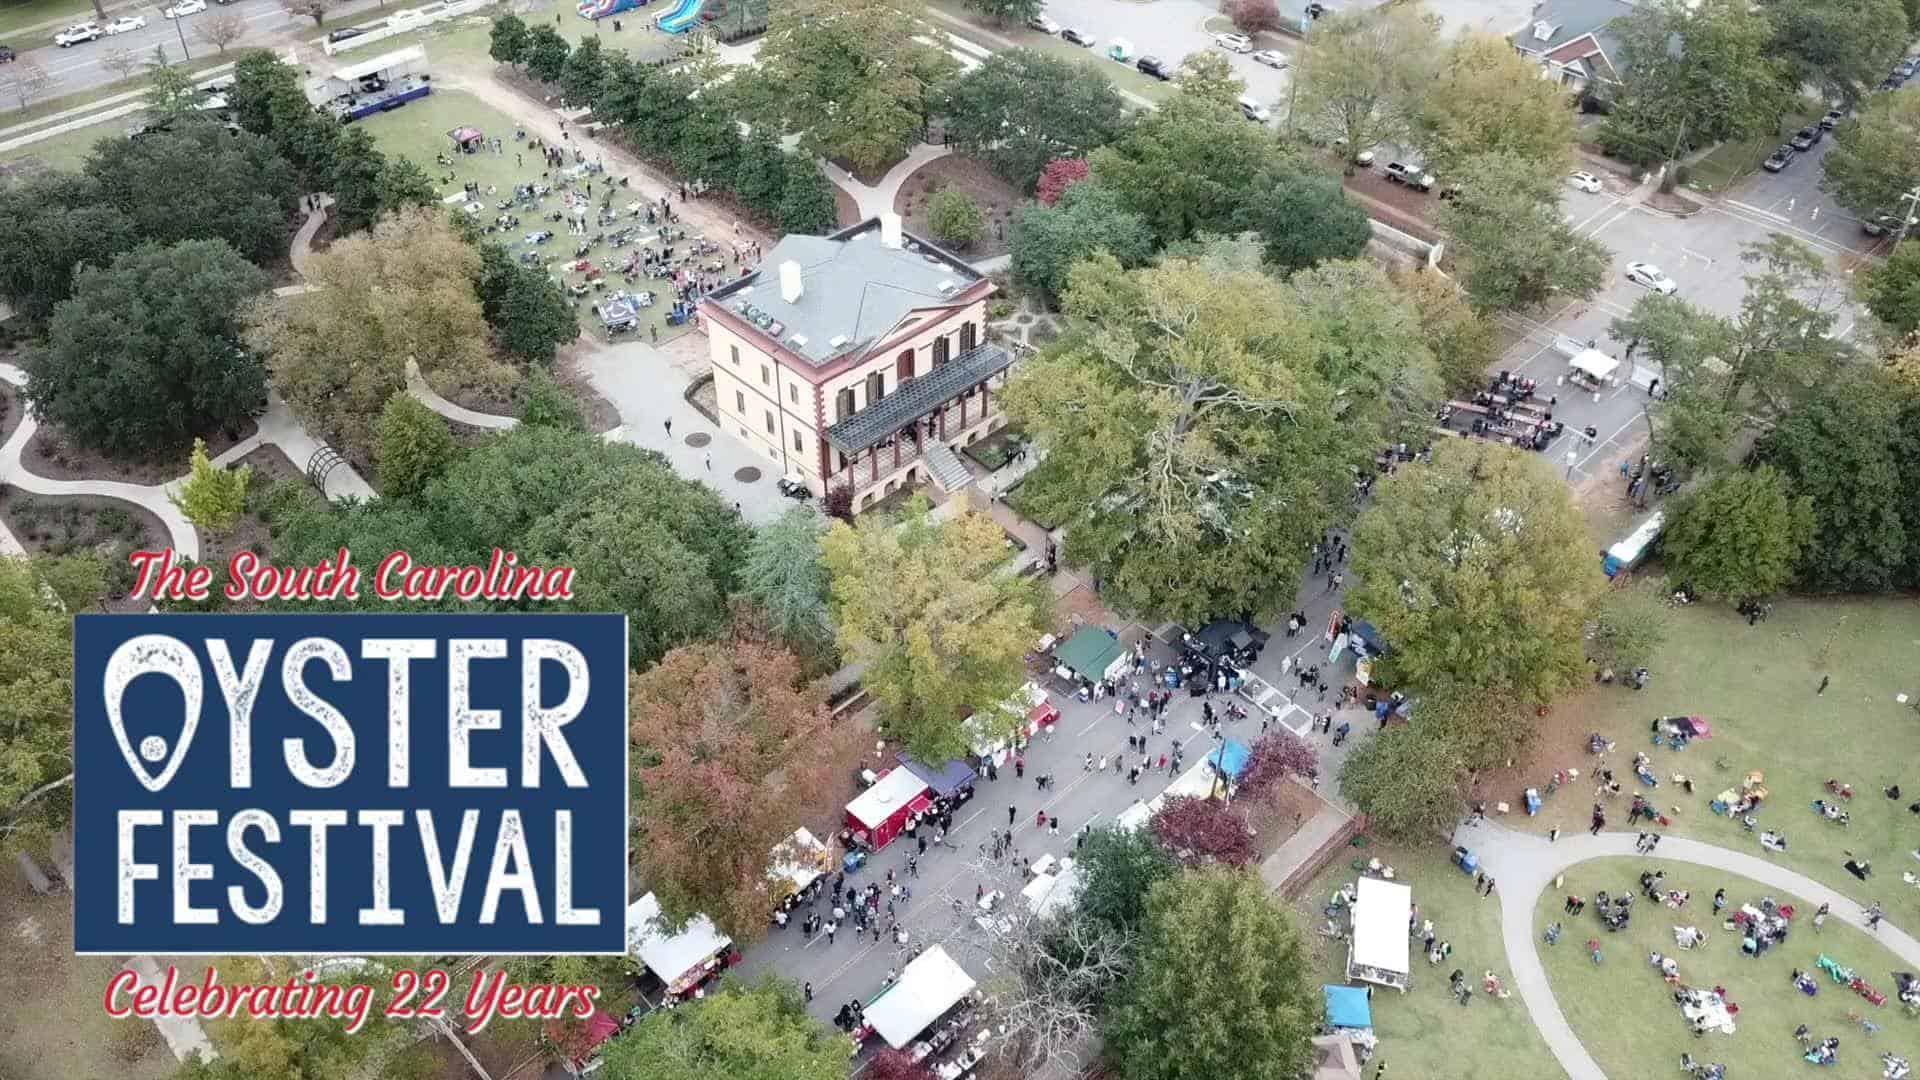 South Carolina Oyster Festival 2019